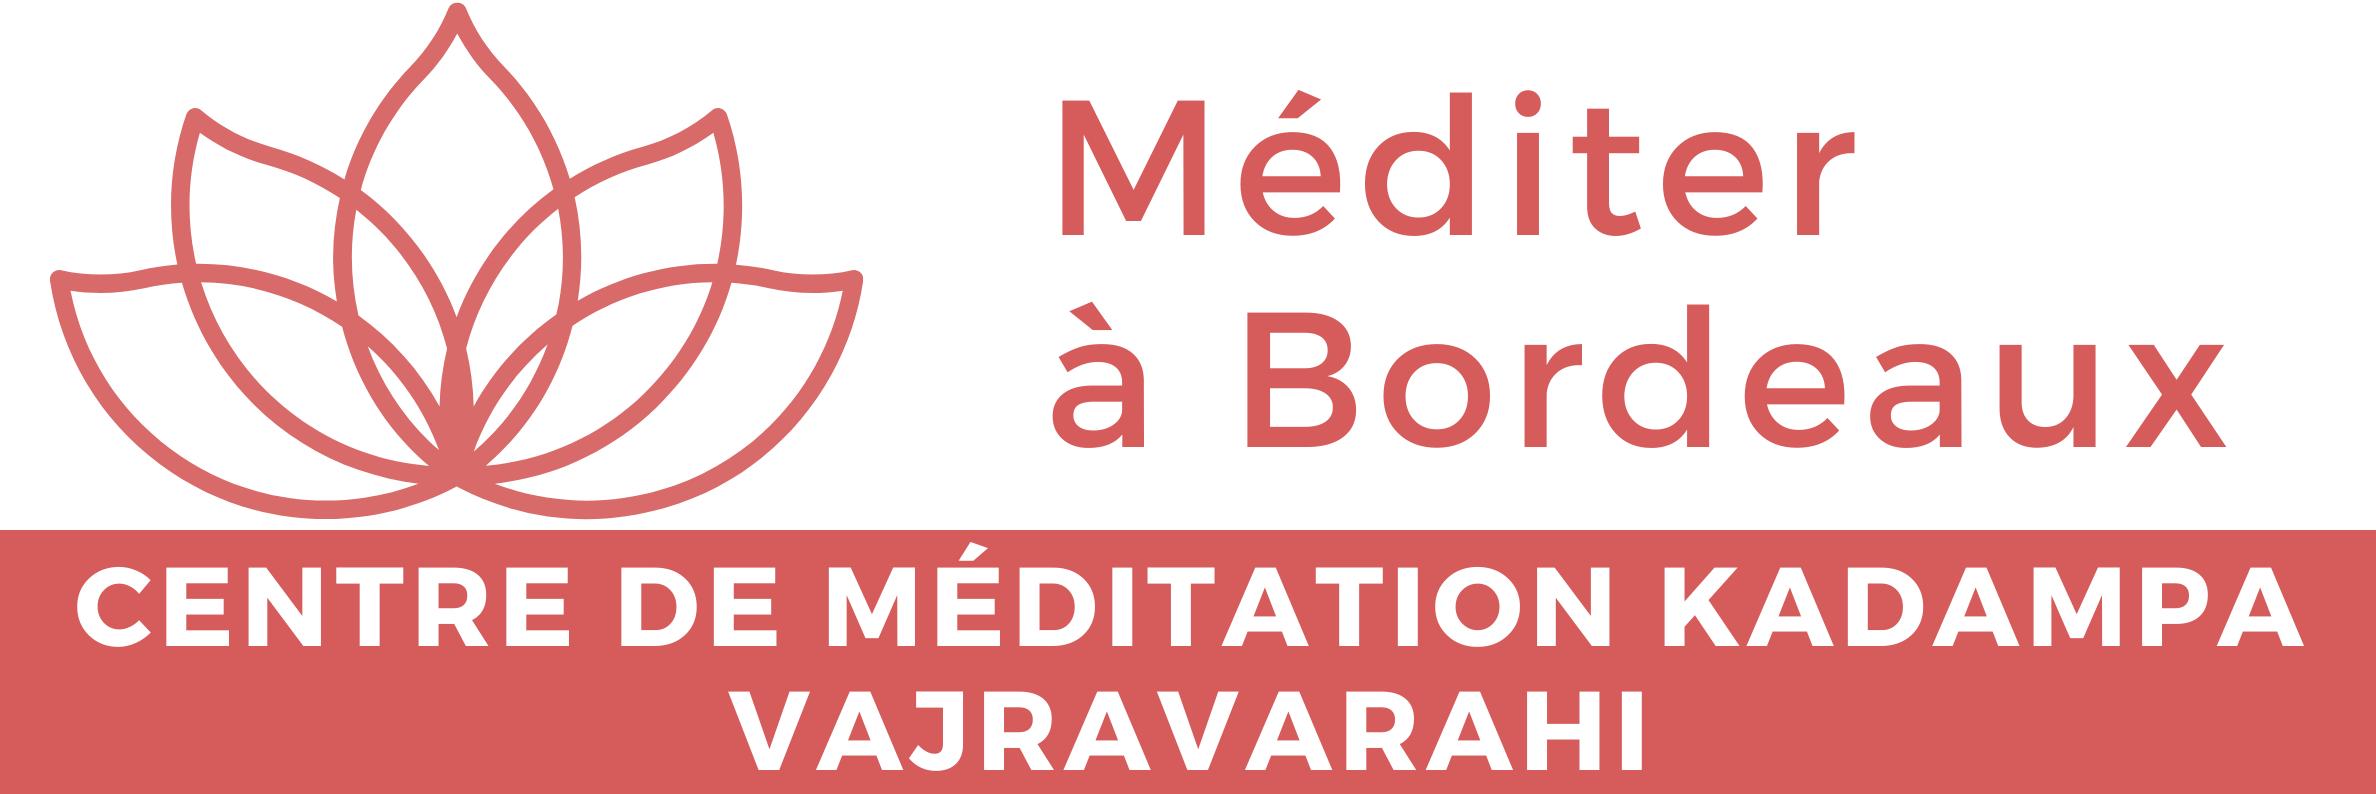 www.meditation-bordeaux.org Logo